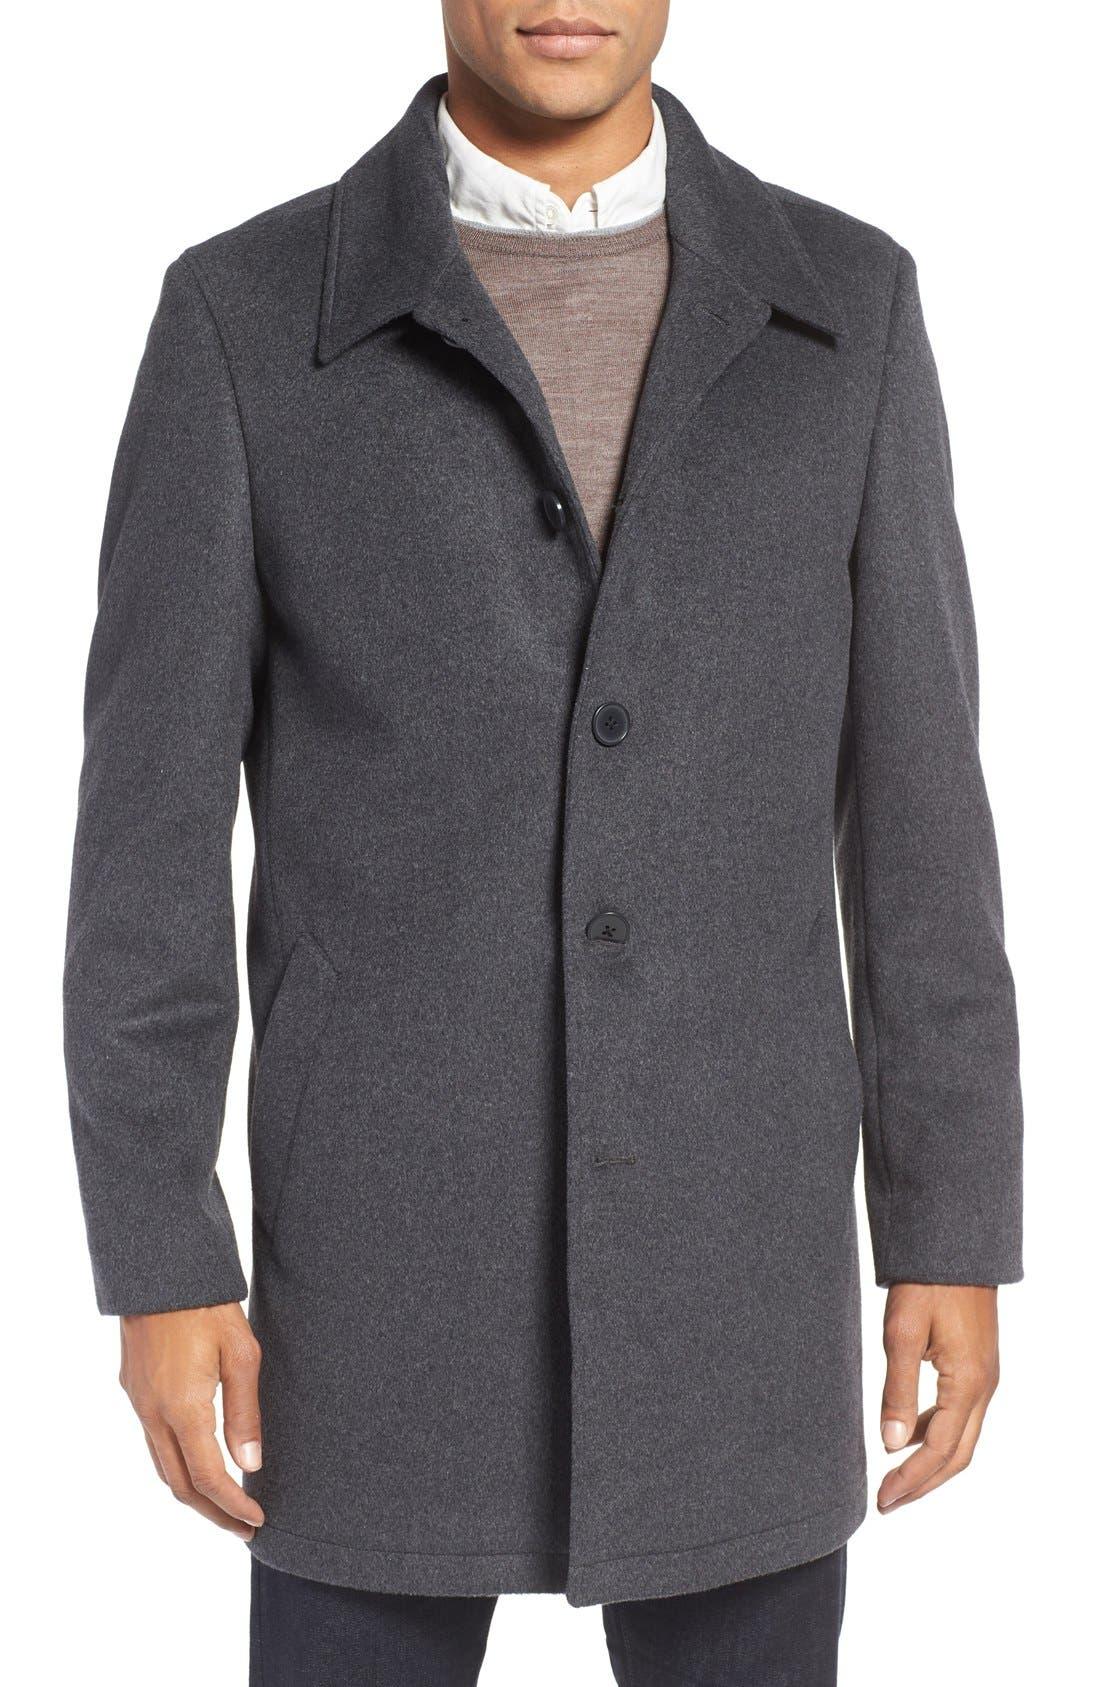 Main Image - Nordstrom Men's Shop Wool Blend Car Coat